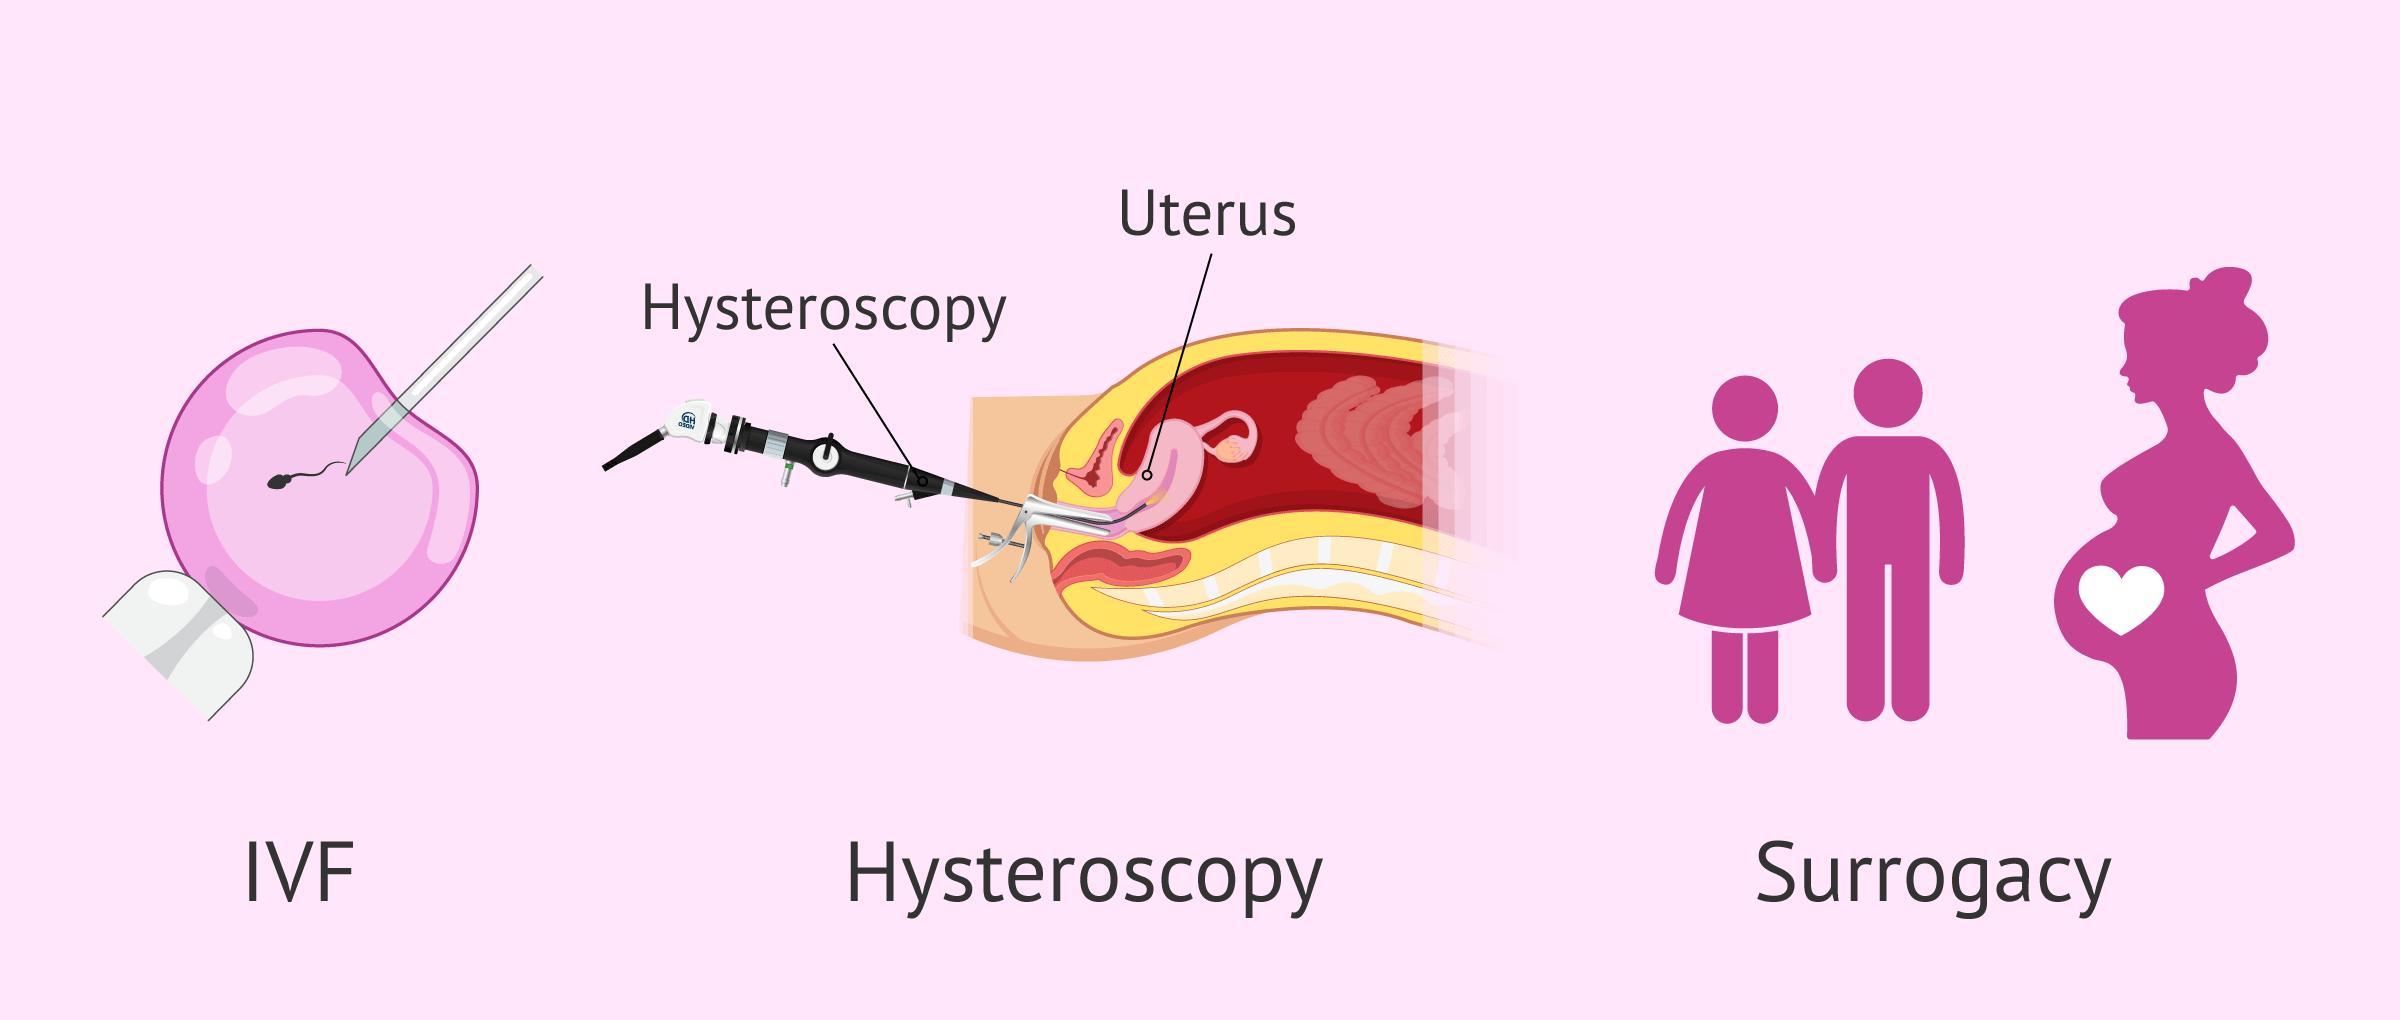 Pregnancy options with uterine abnormalities